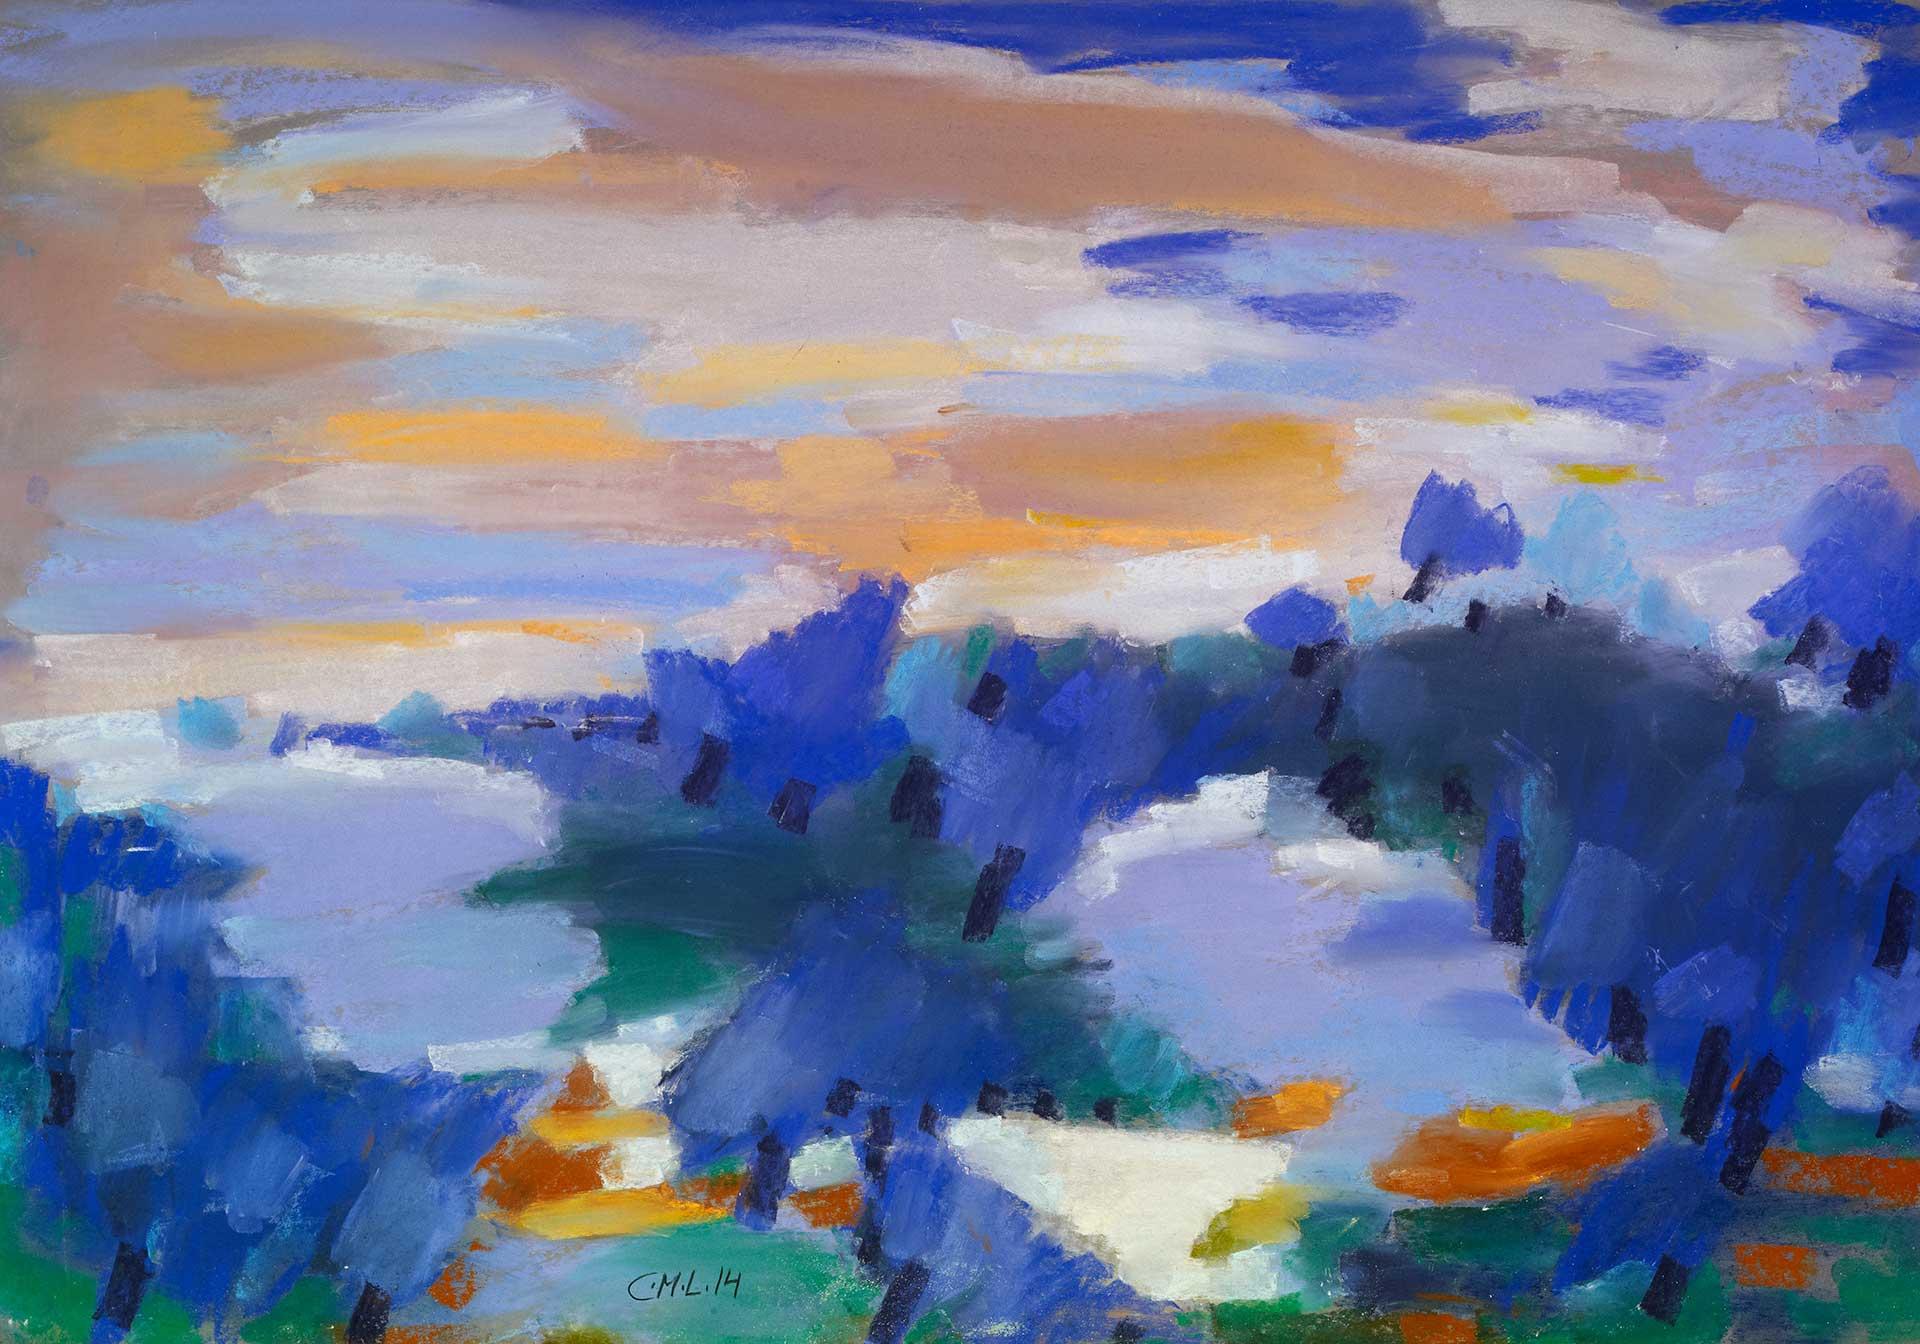 carmen-lins-01-2014_07-Blaue-Welt-90x70cm